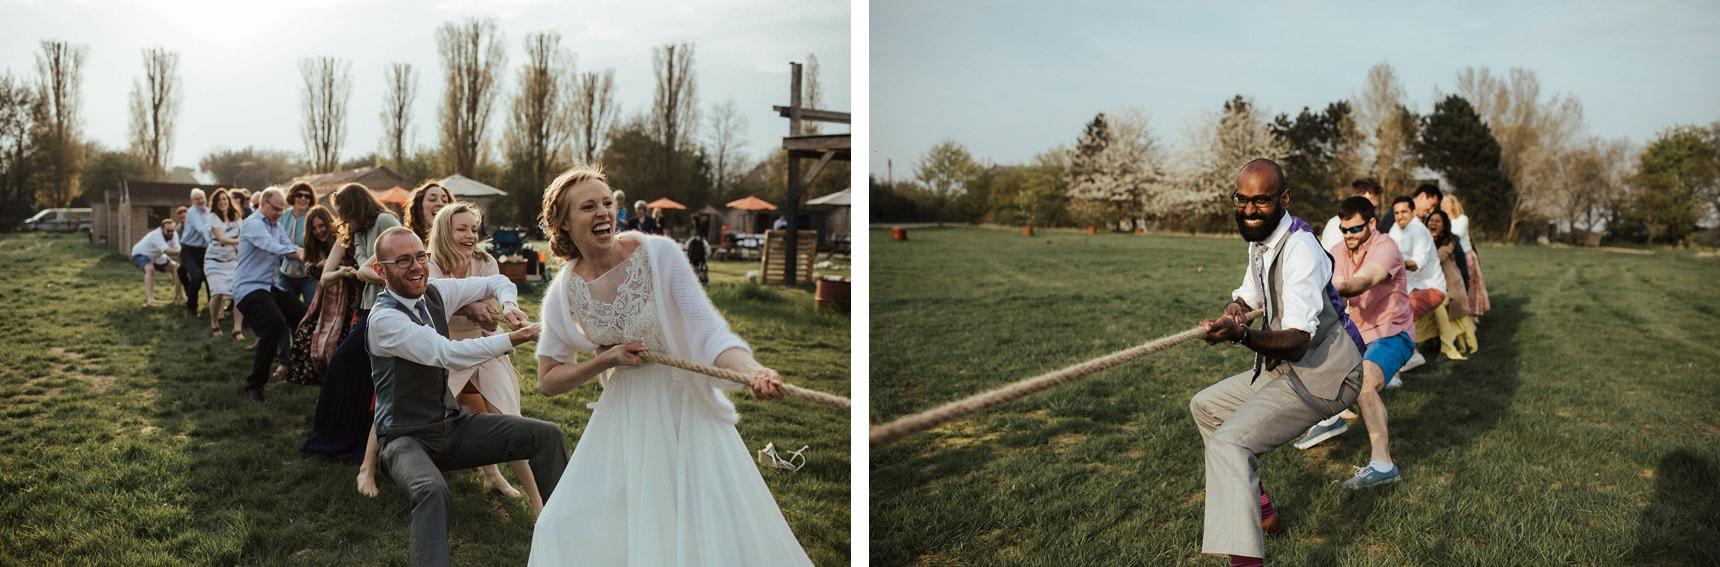 wedding fun and games